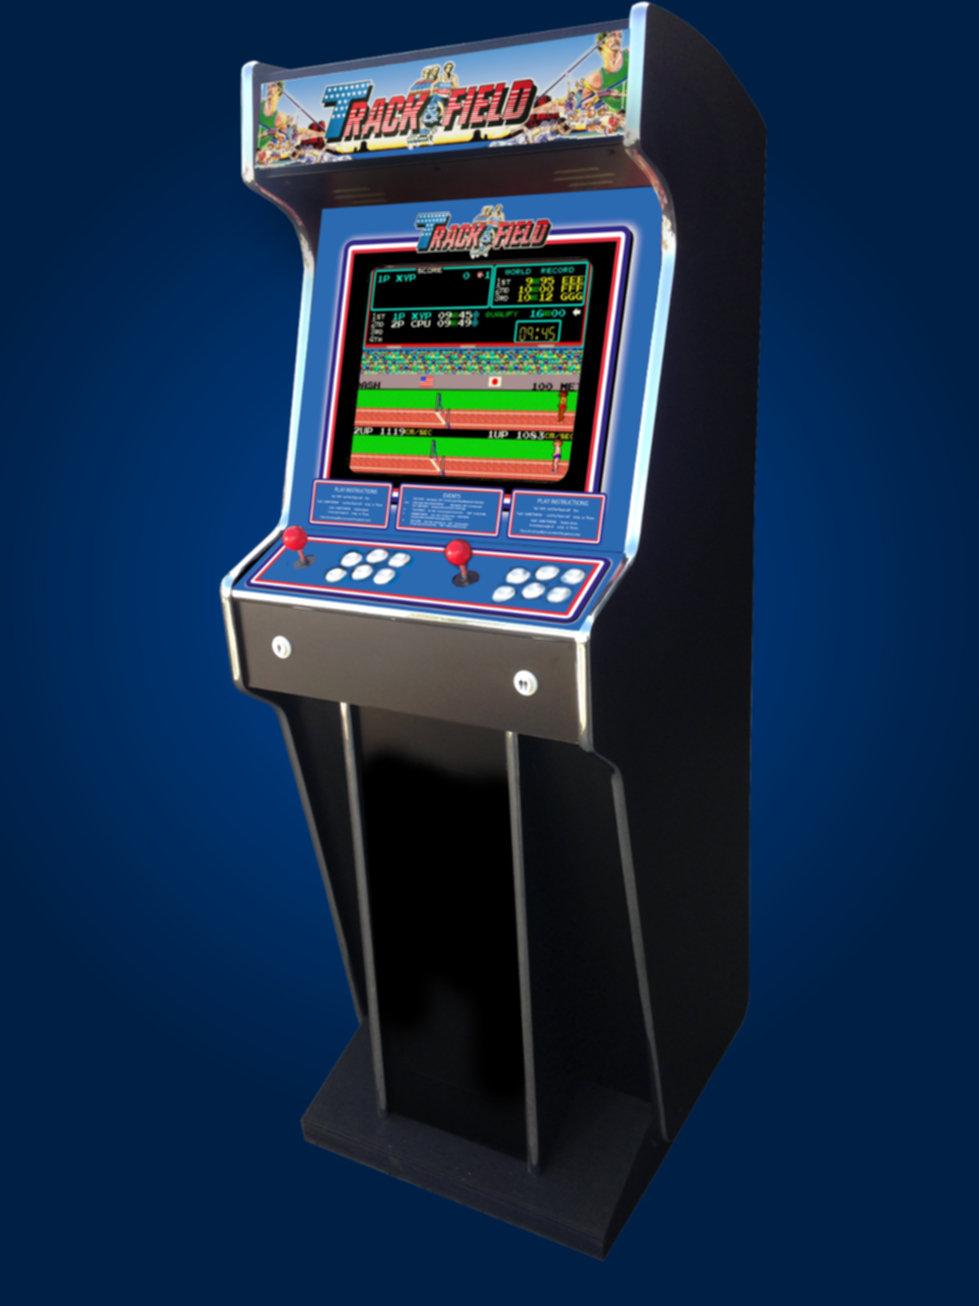 Track & Field Arcade   arcade-base